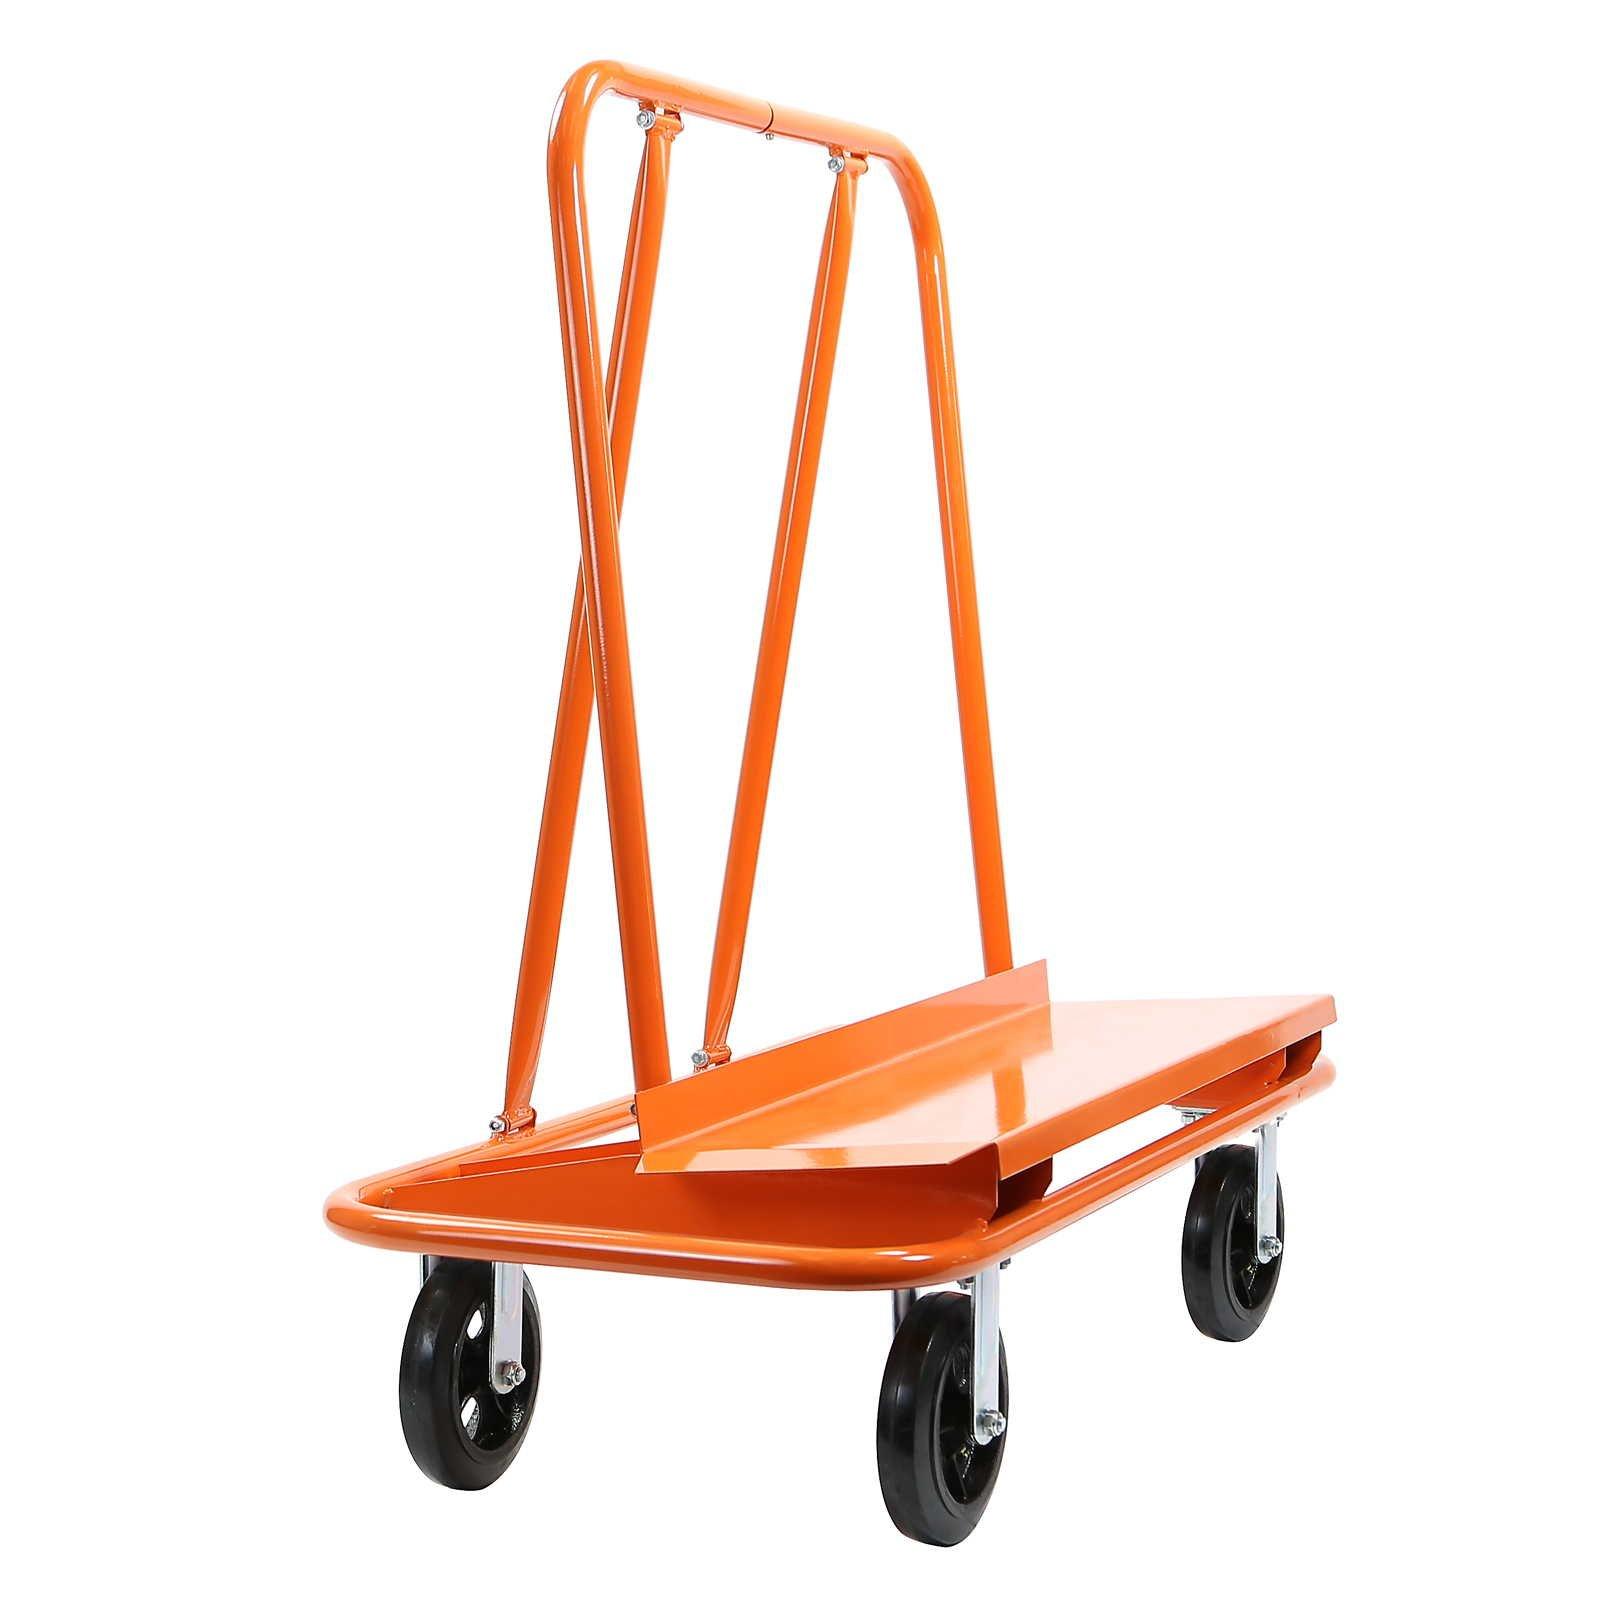 GypTool Heavy Duty Drywall Sheet Cart & Panel Dolly with 4 Swivel Wheels - Orange by GypTool